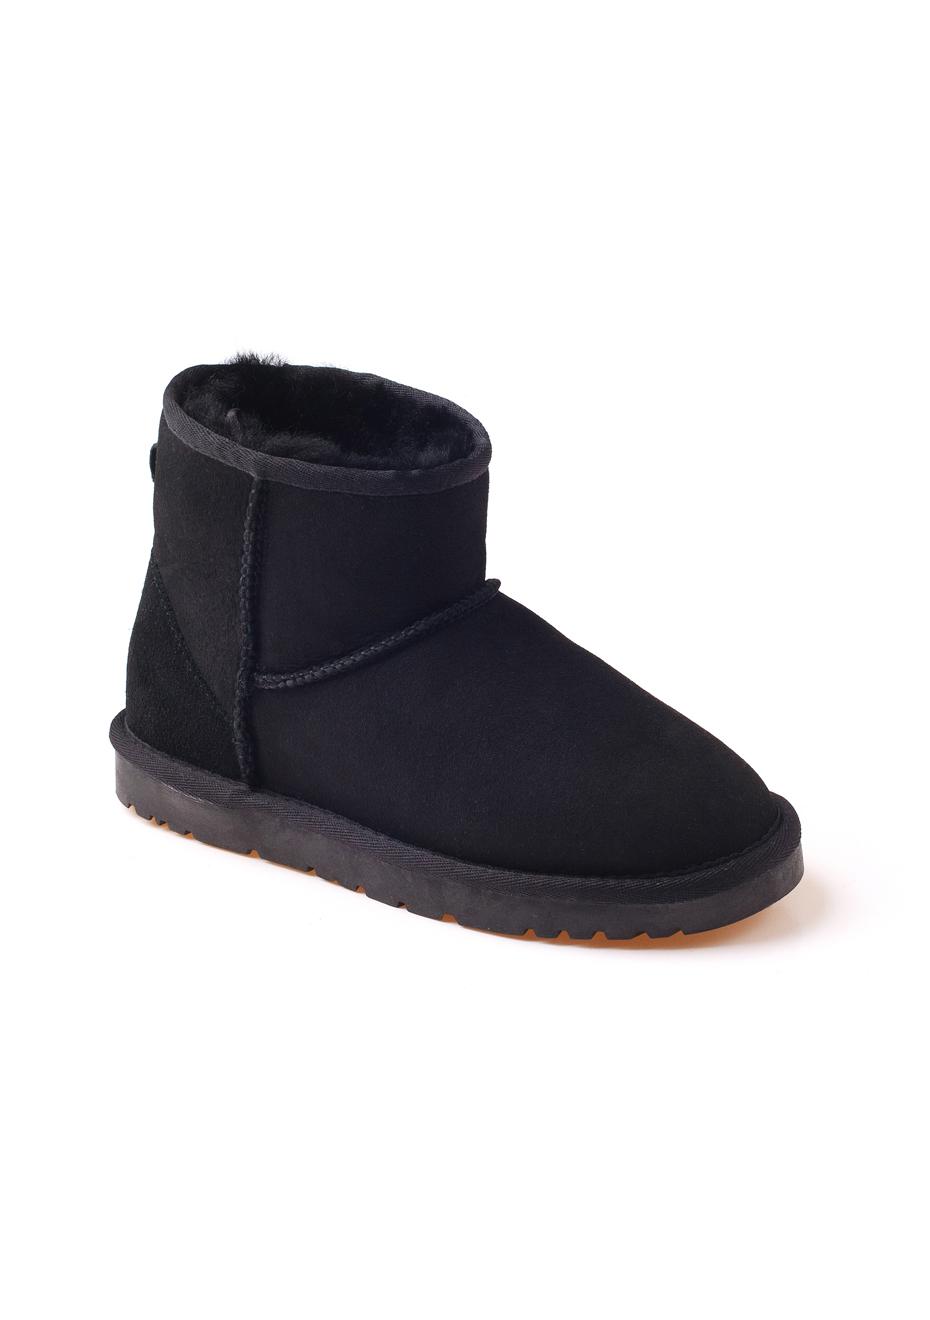 uggs slipper classic nz